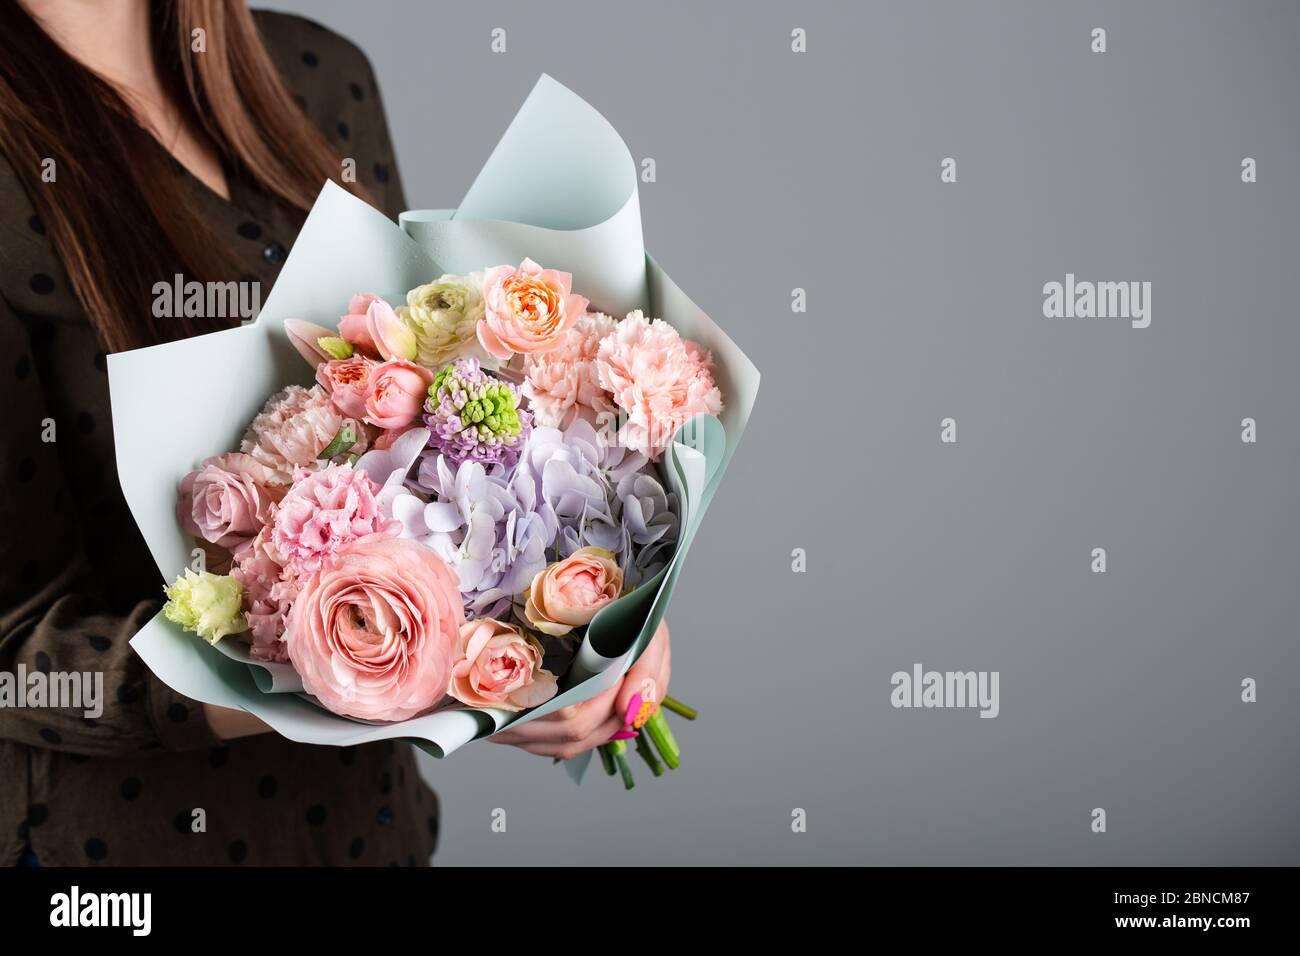 Beautiful Bouquet Of Flowers Roses Hydrangea Tulip Carnation Stock Photo Alamy